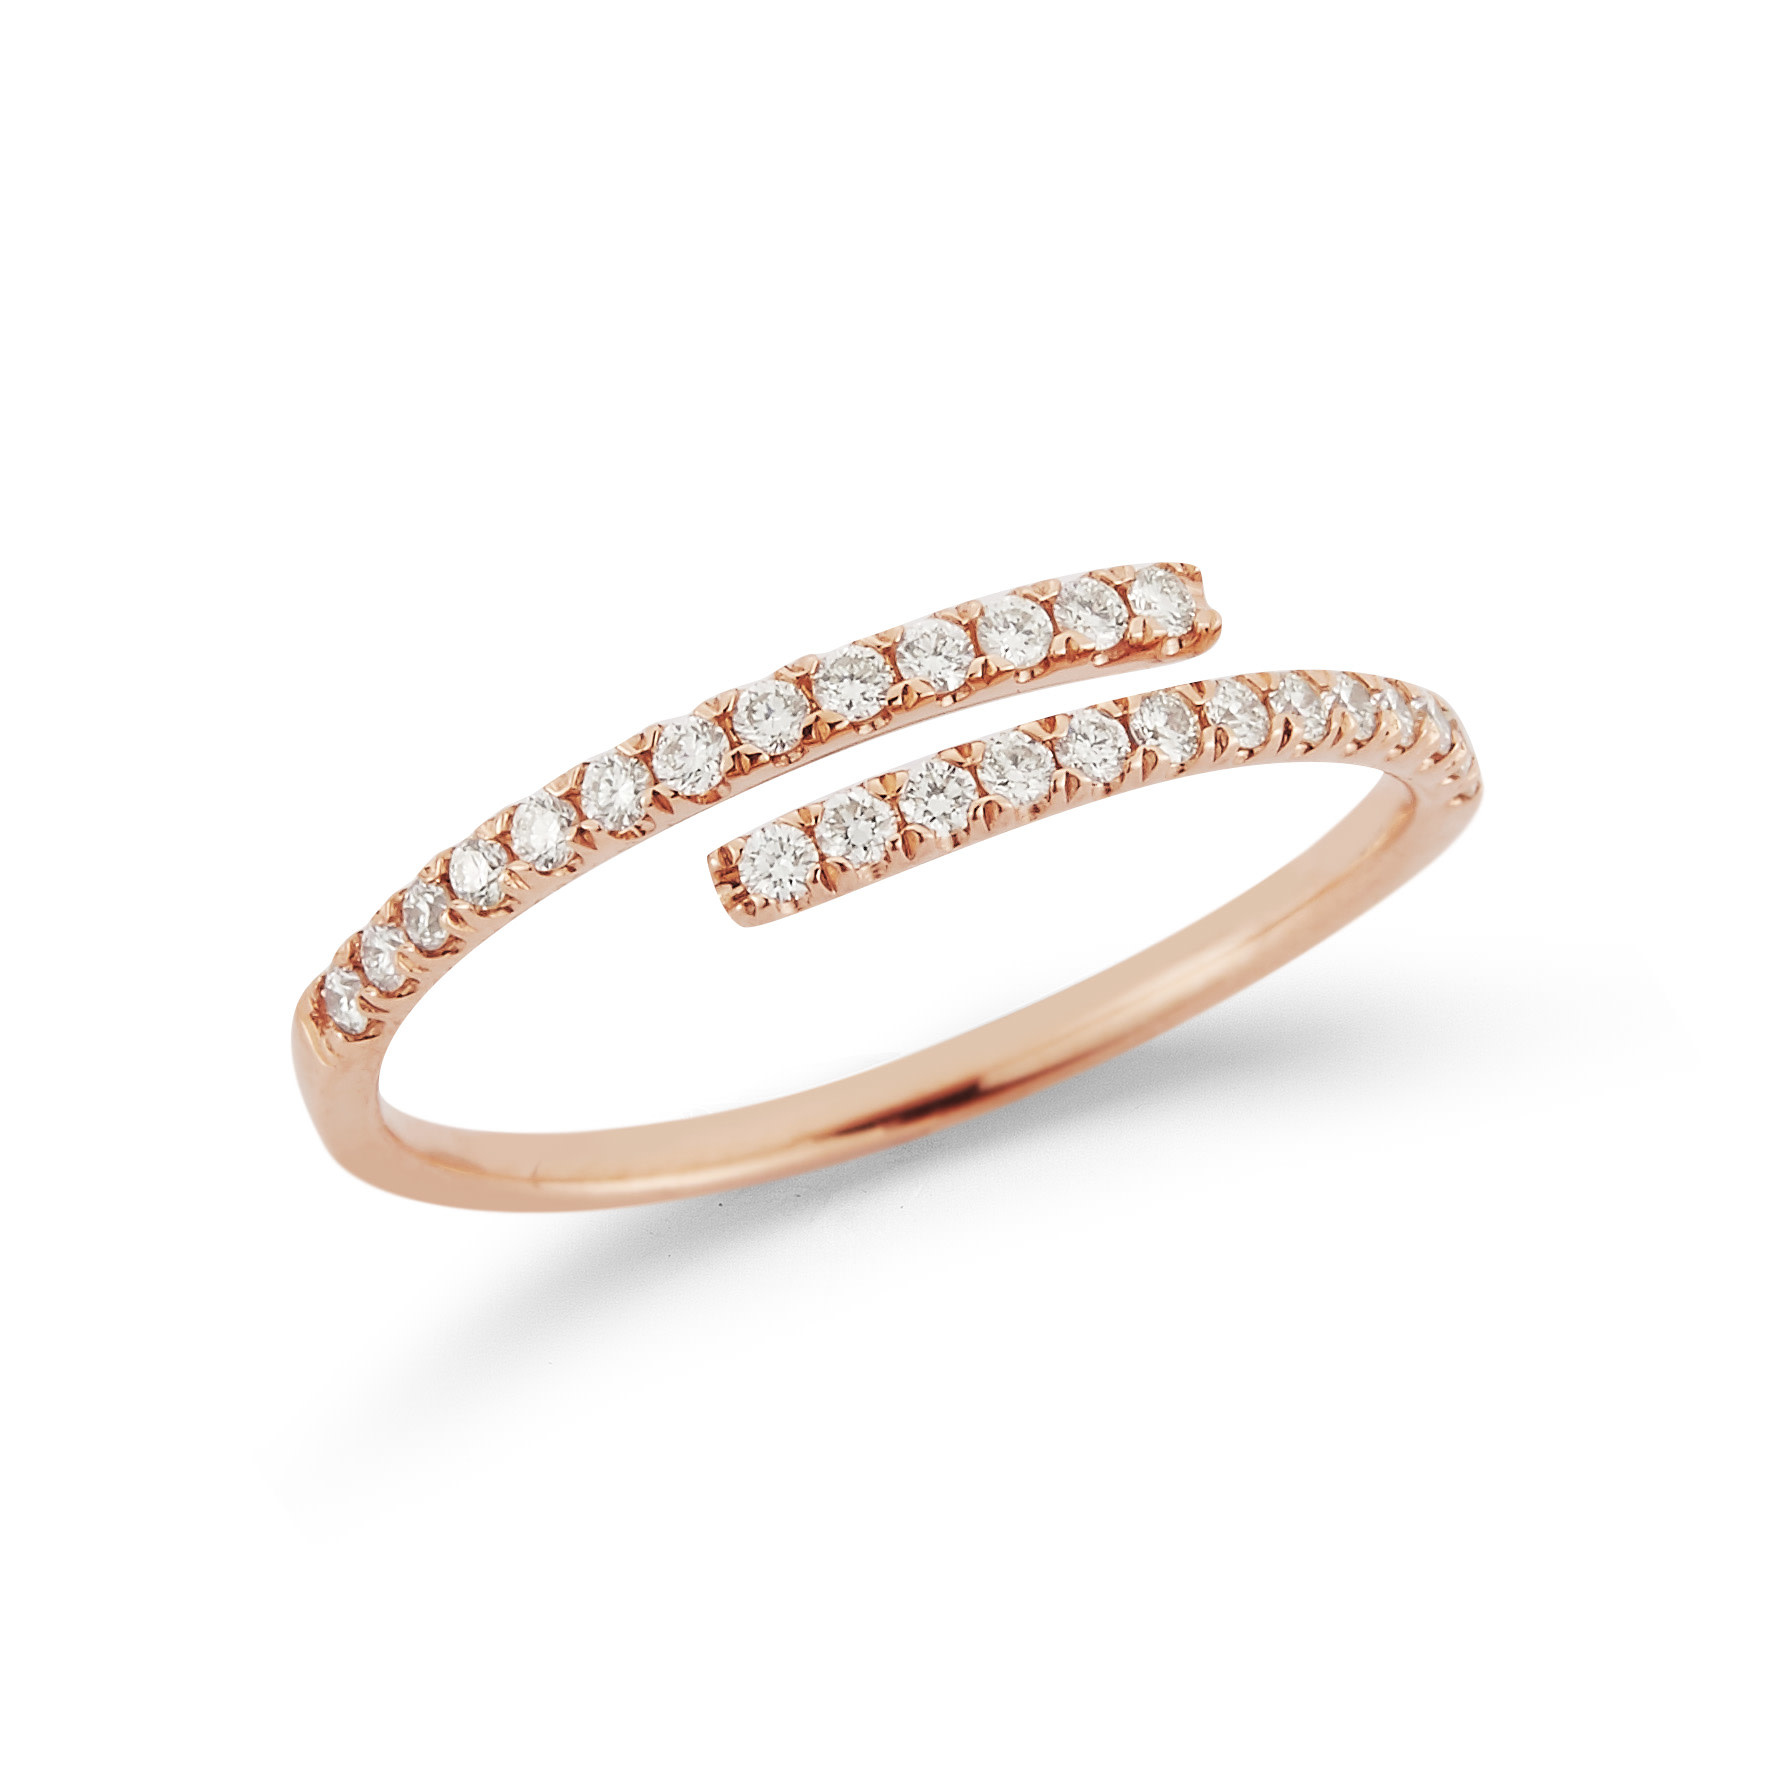 Dana Rebecca Lauren Joy Bypass Diamond Rose Gold Ring